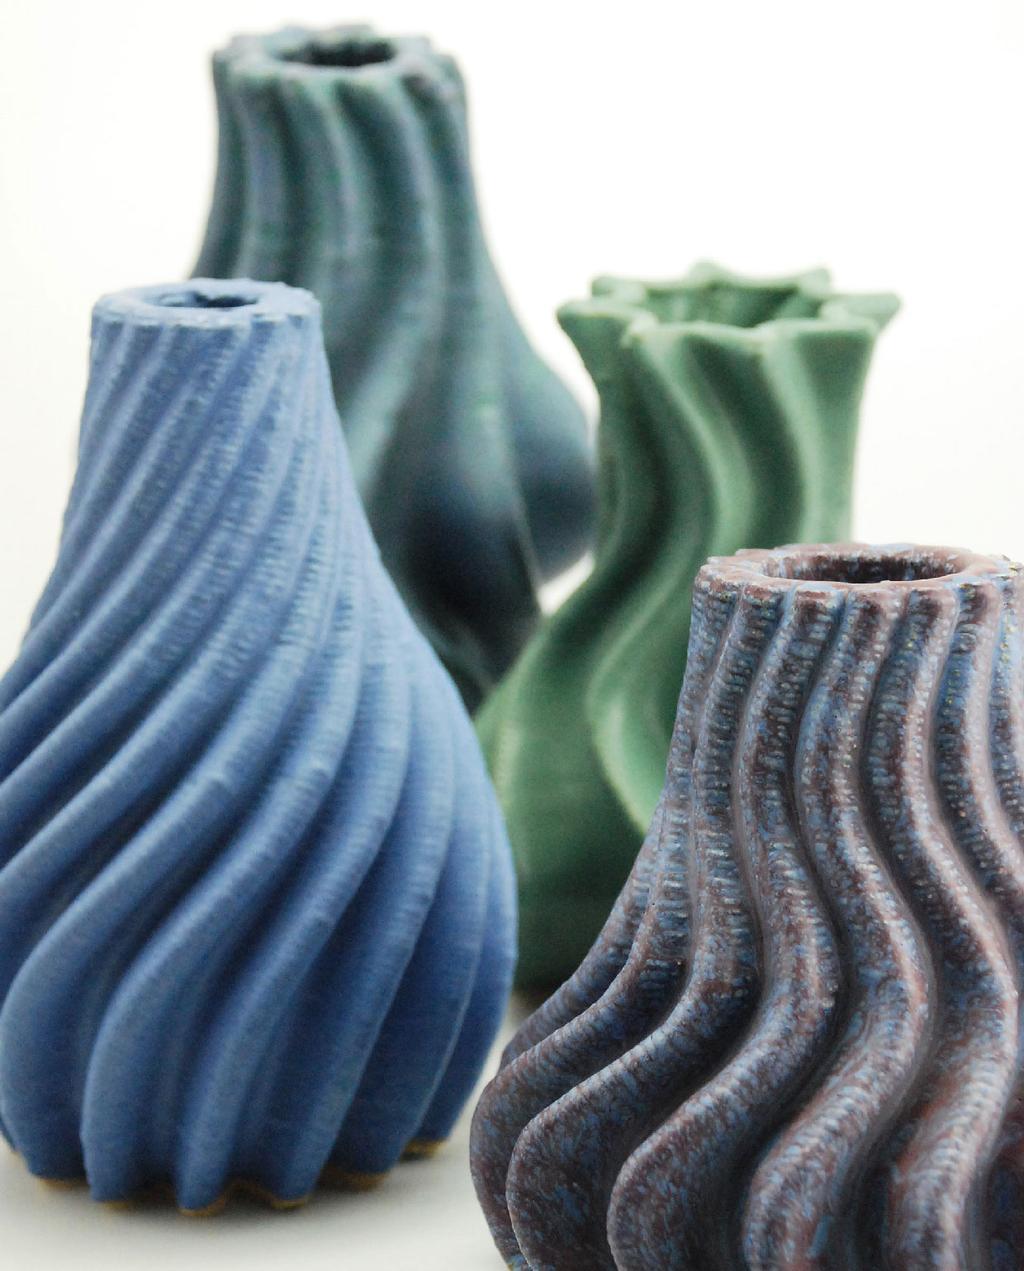 vtwonen blog studentdesign | 3D printen vier organisch gevormde vazen